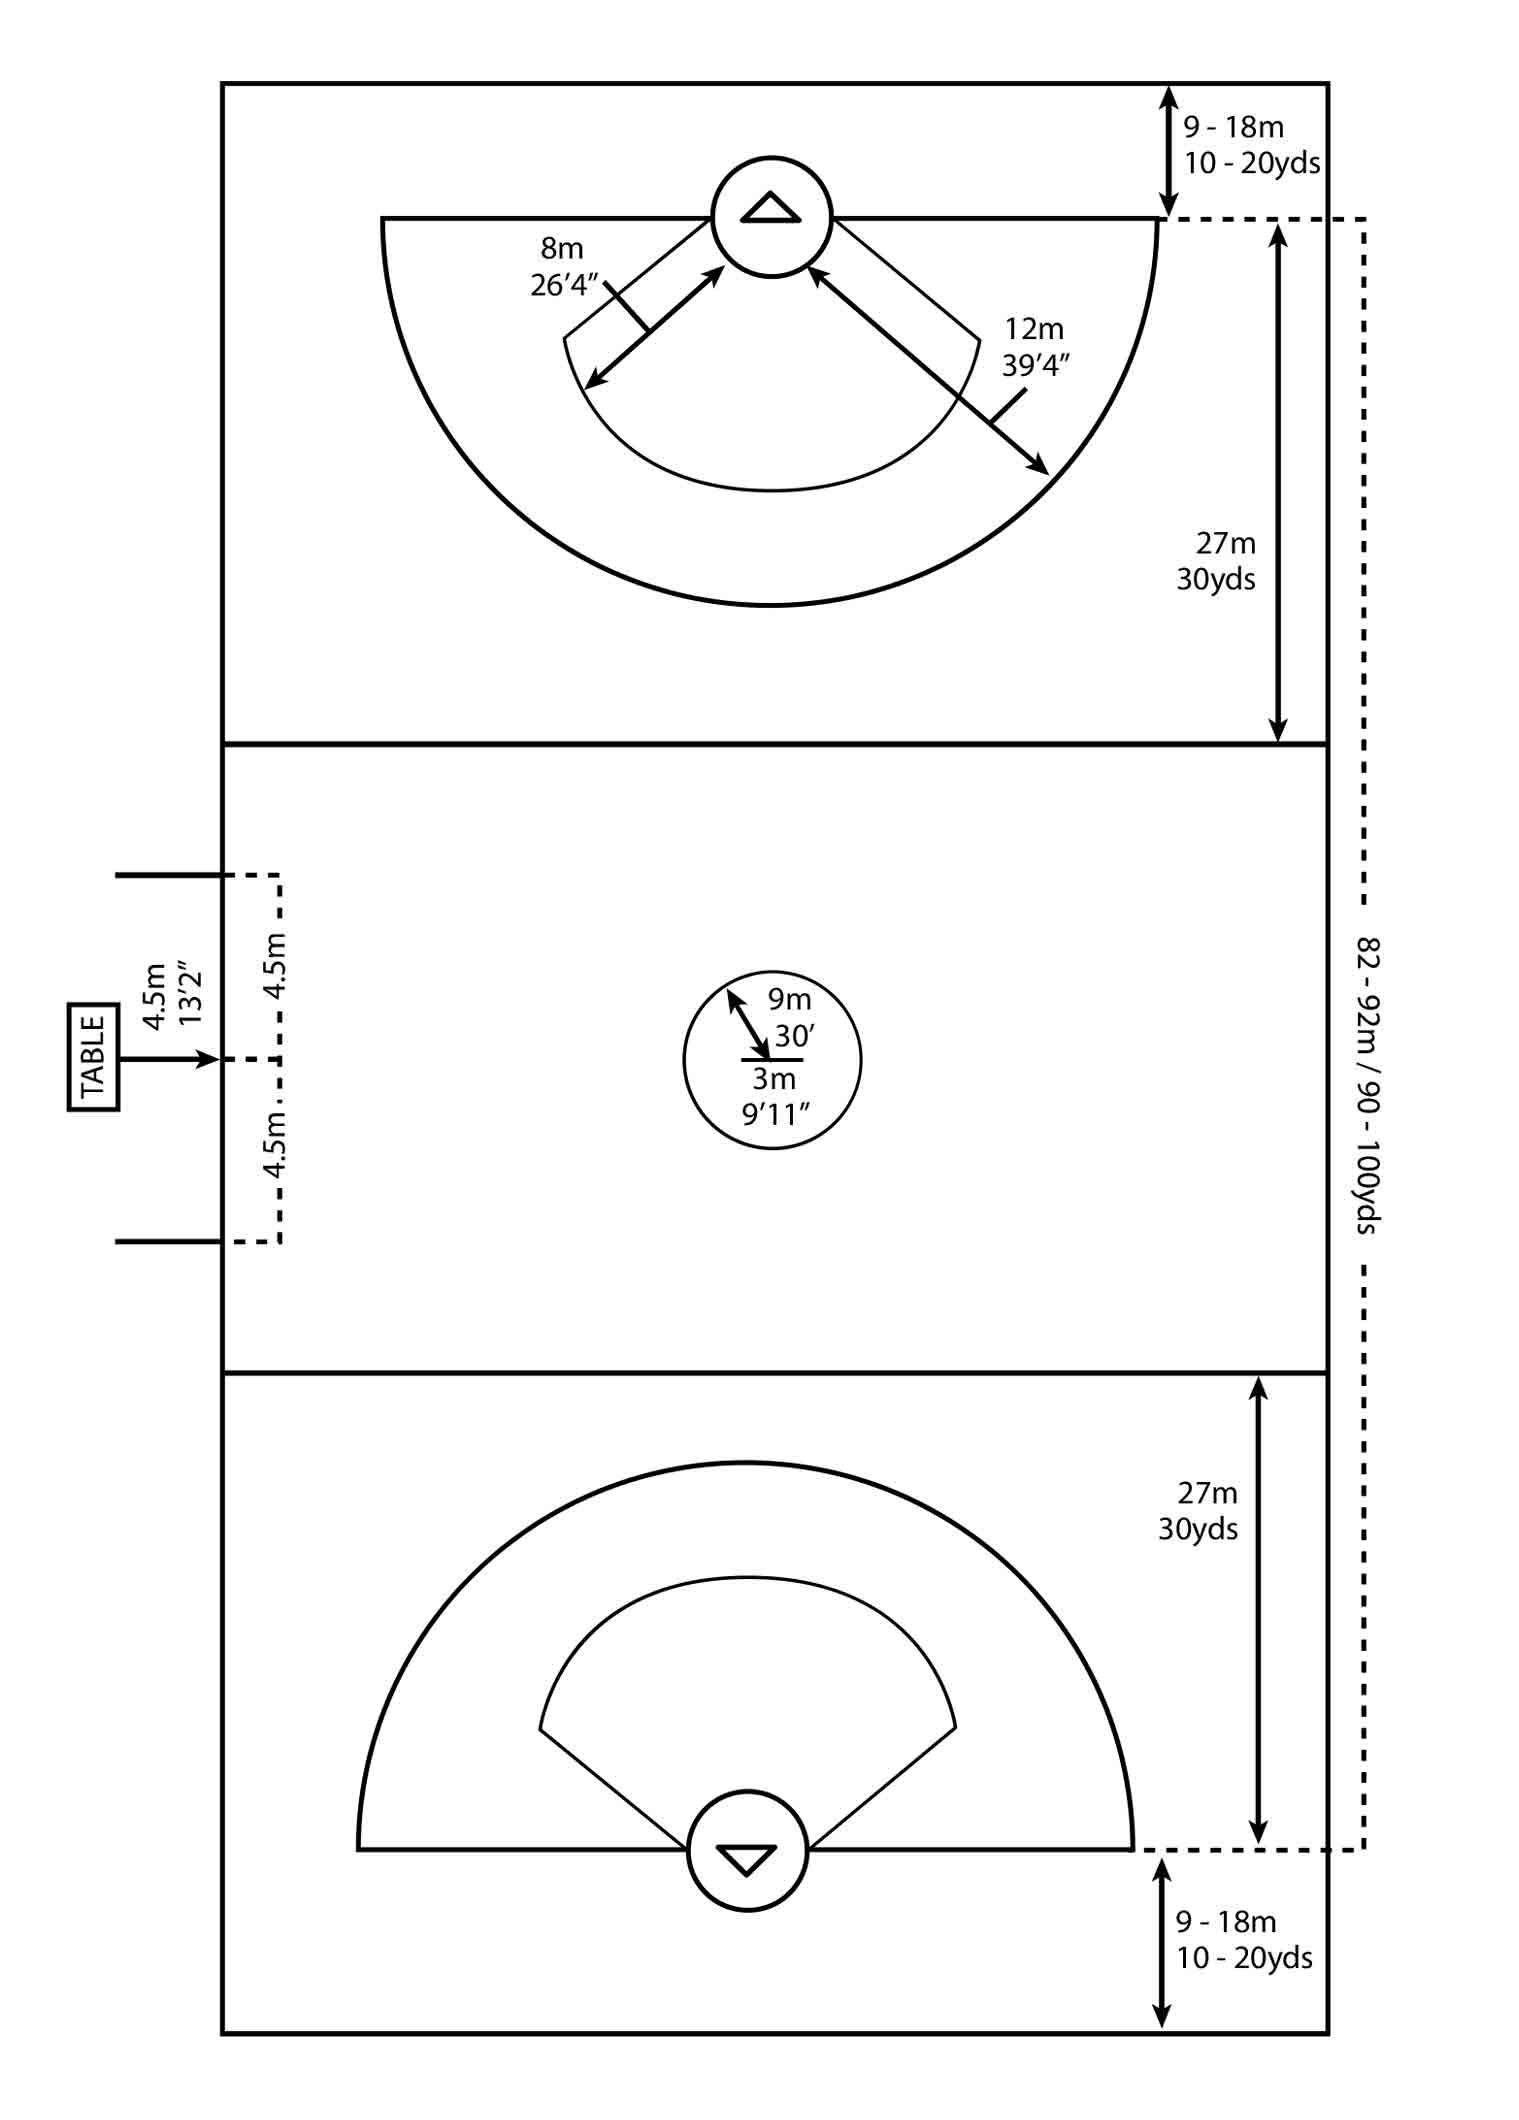 Field Diagrams Lacrosse Party Lacrosse Diagram